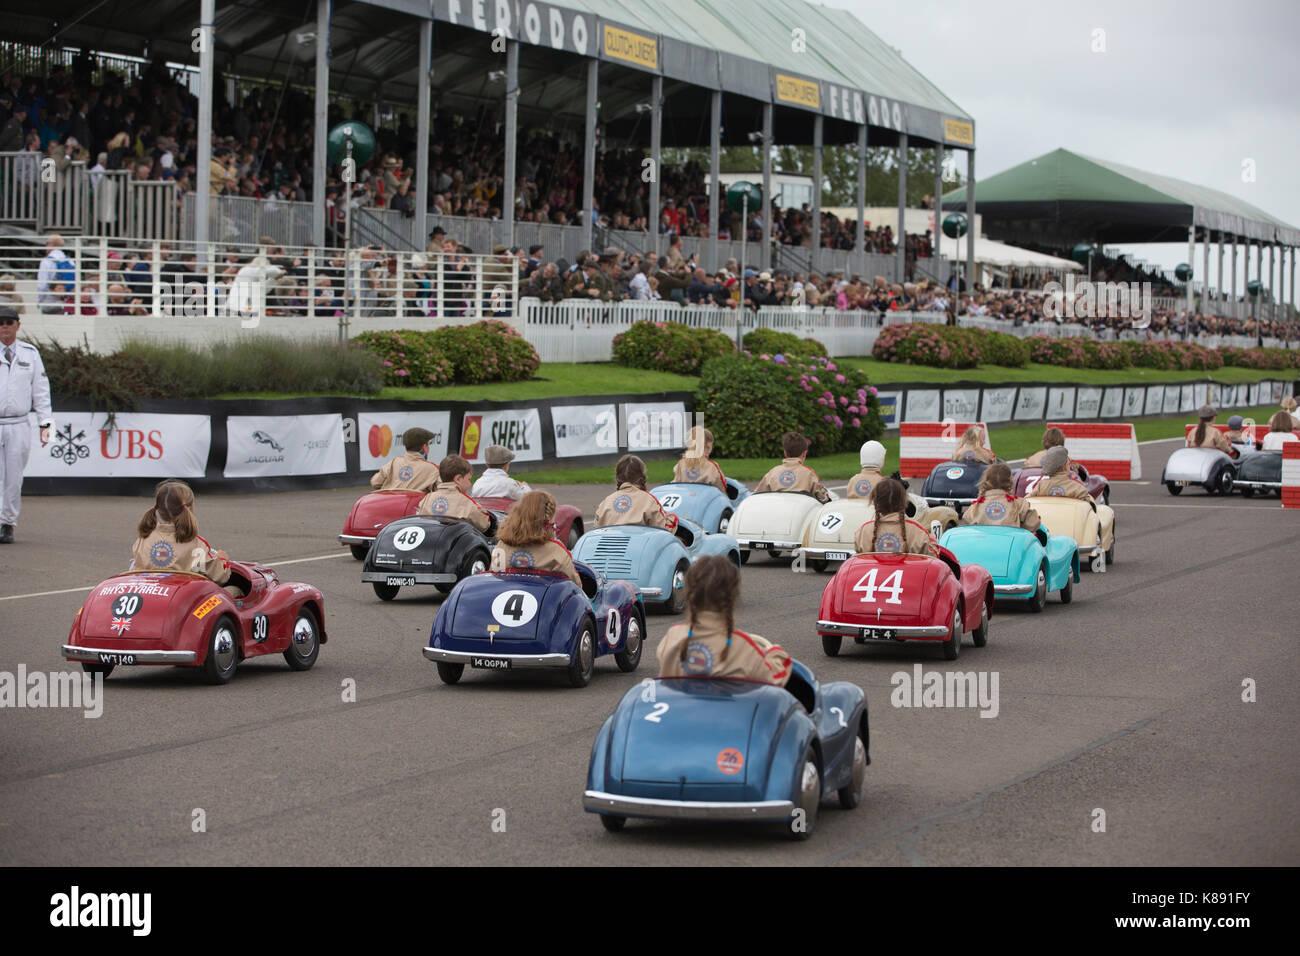 Settrington Cup Wettbewerb für Austin J40 Pedal Cars in Goodwood Revival 2017 Konferenz, Goodwood Rennstrecke, Stockbild